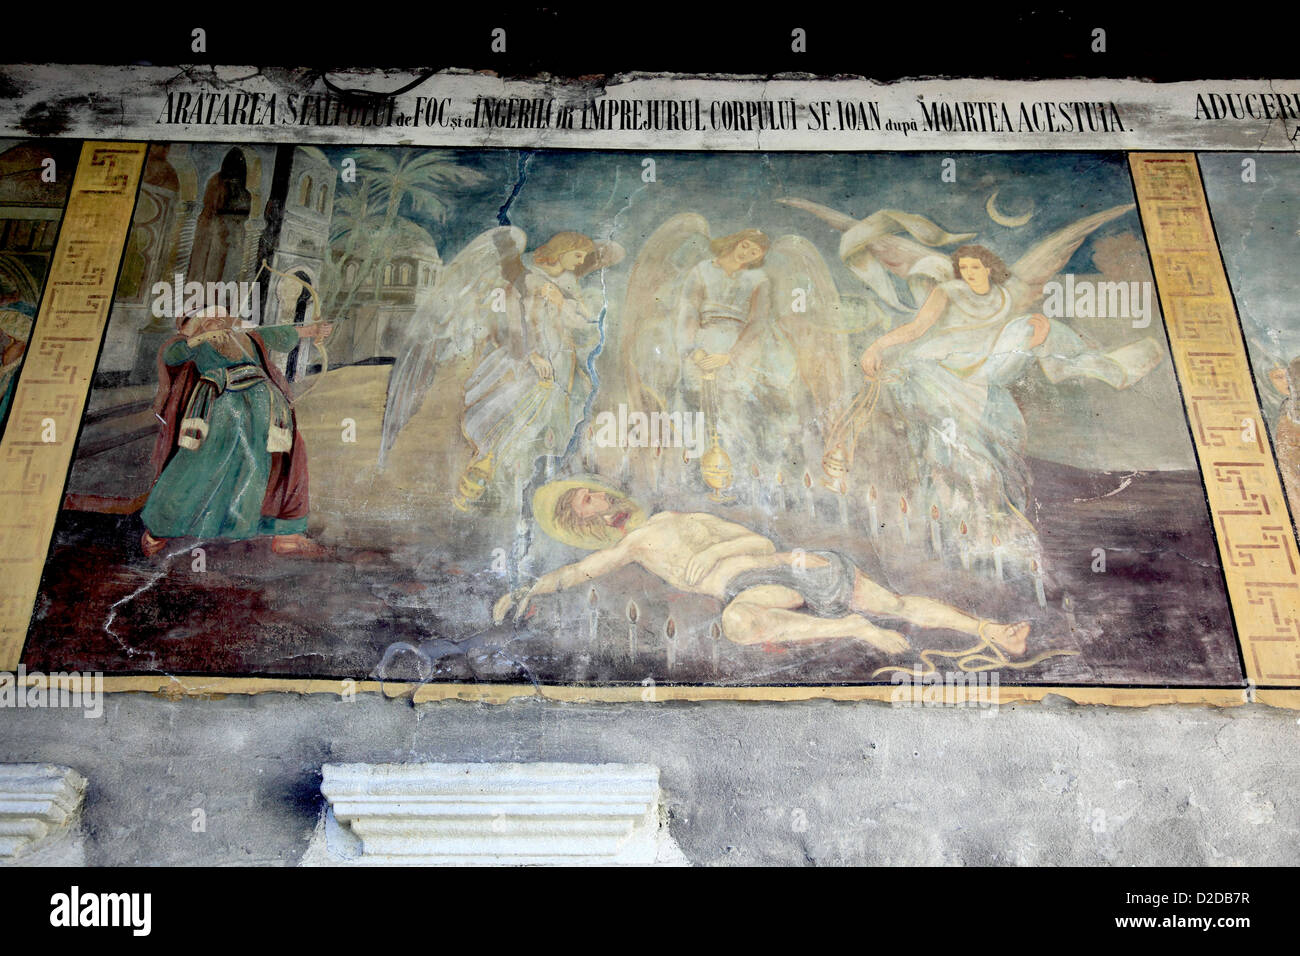 Mural Paintung, Flodor Iancu, Suceava, Romania, Kloster St. Gheorghe, Biserica Sf. Gheorghe Mirauiti, in Suceava, - Stock Image